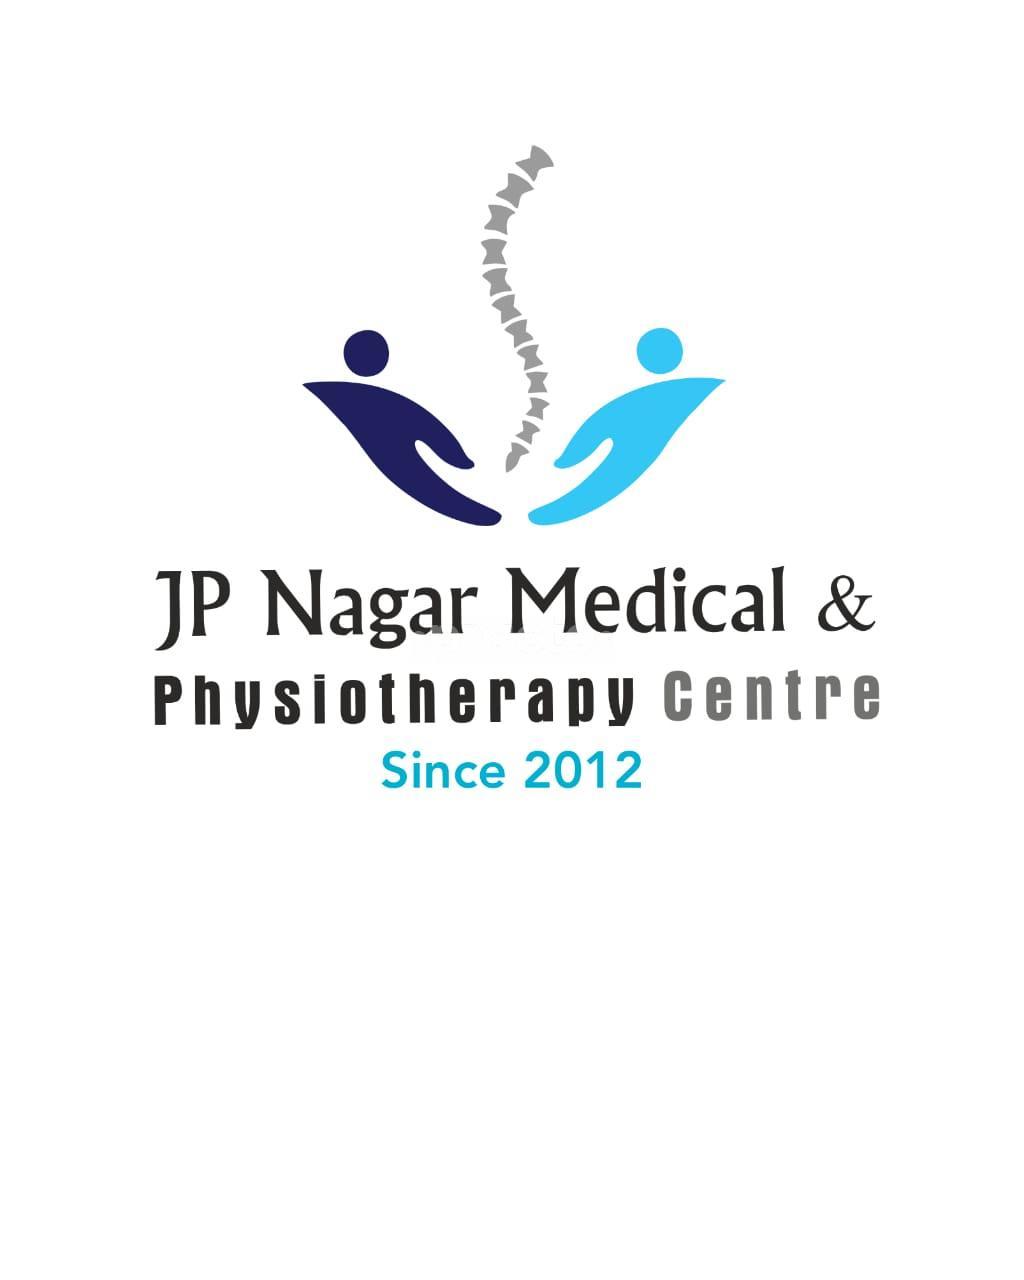 JP Nagar Medical and Physiotherapy Centre